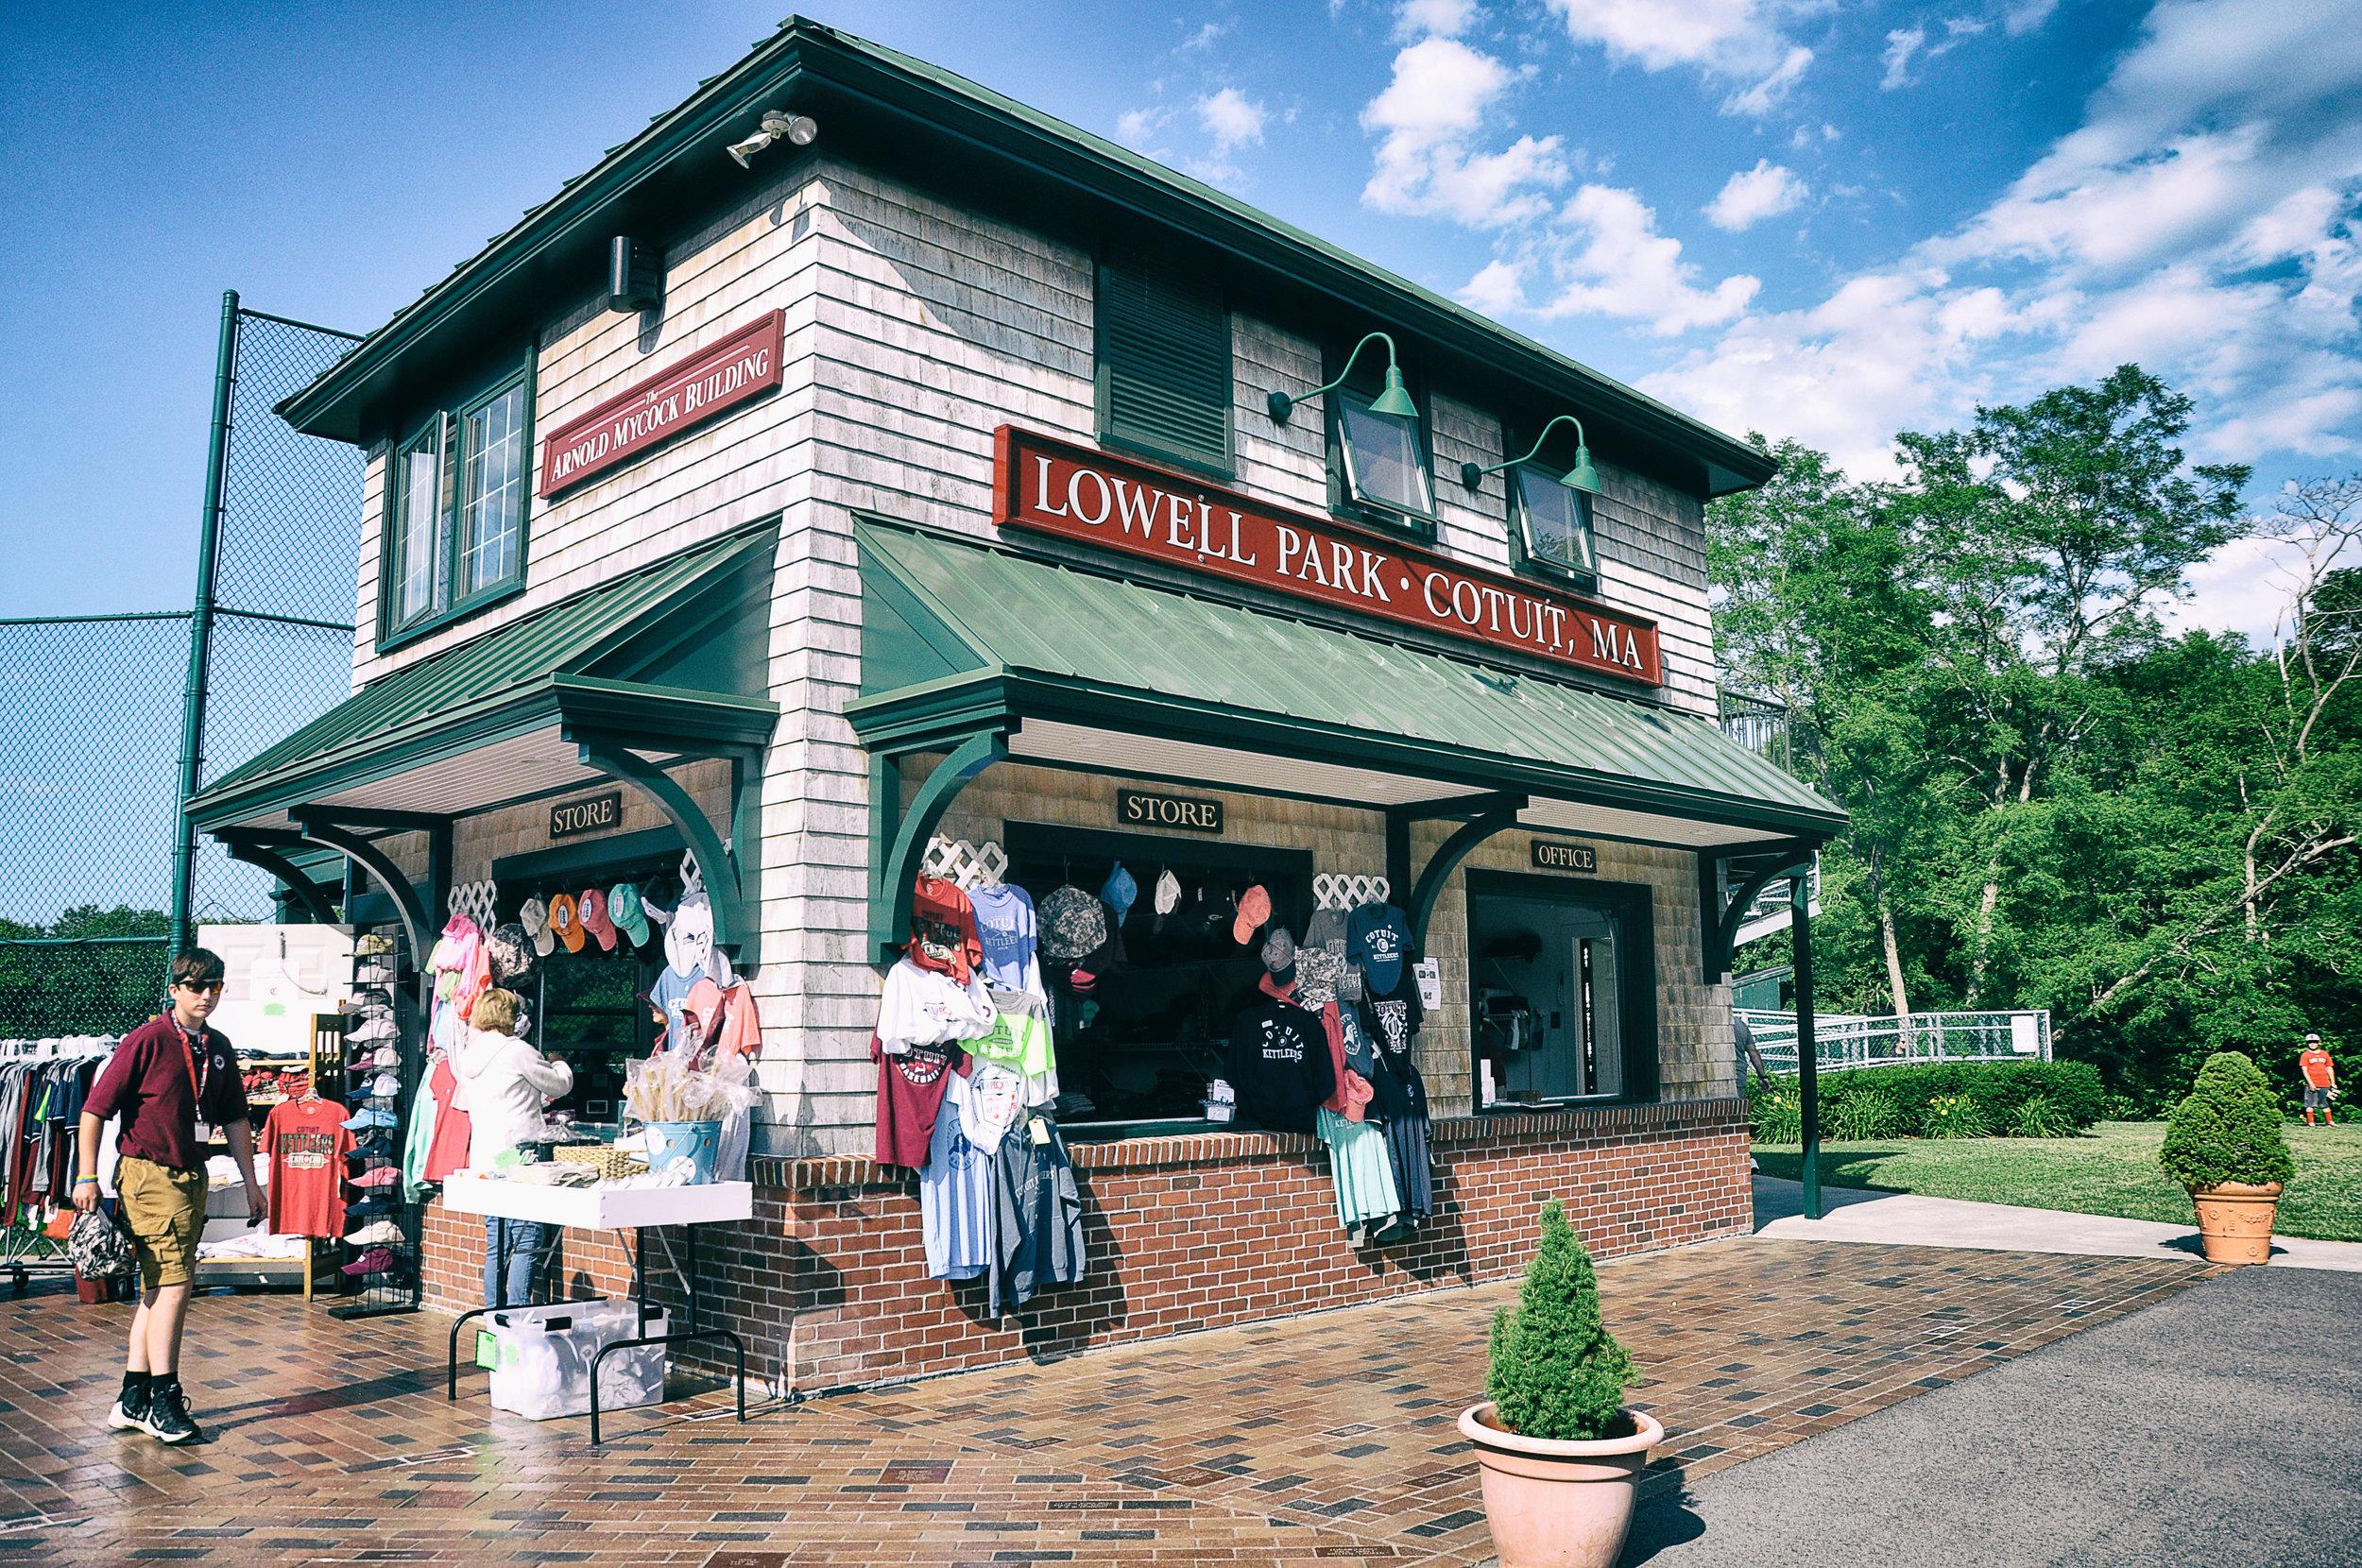 Cot Lowell Park - Copy.jpg